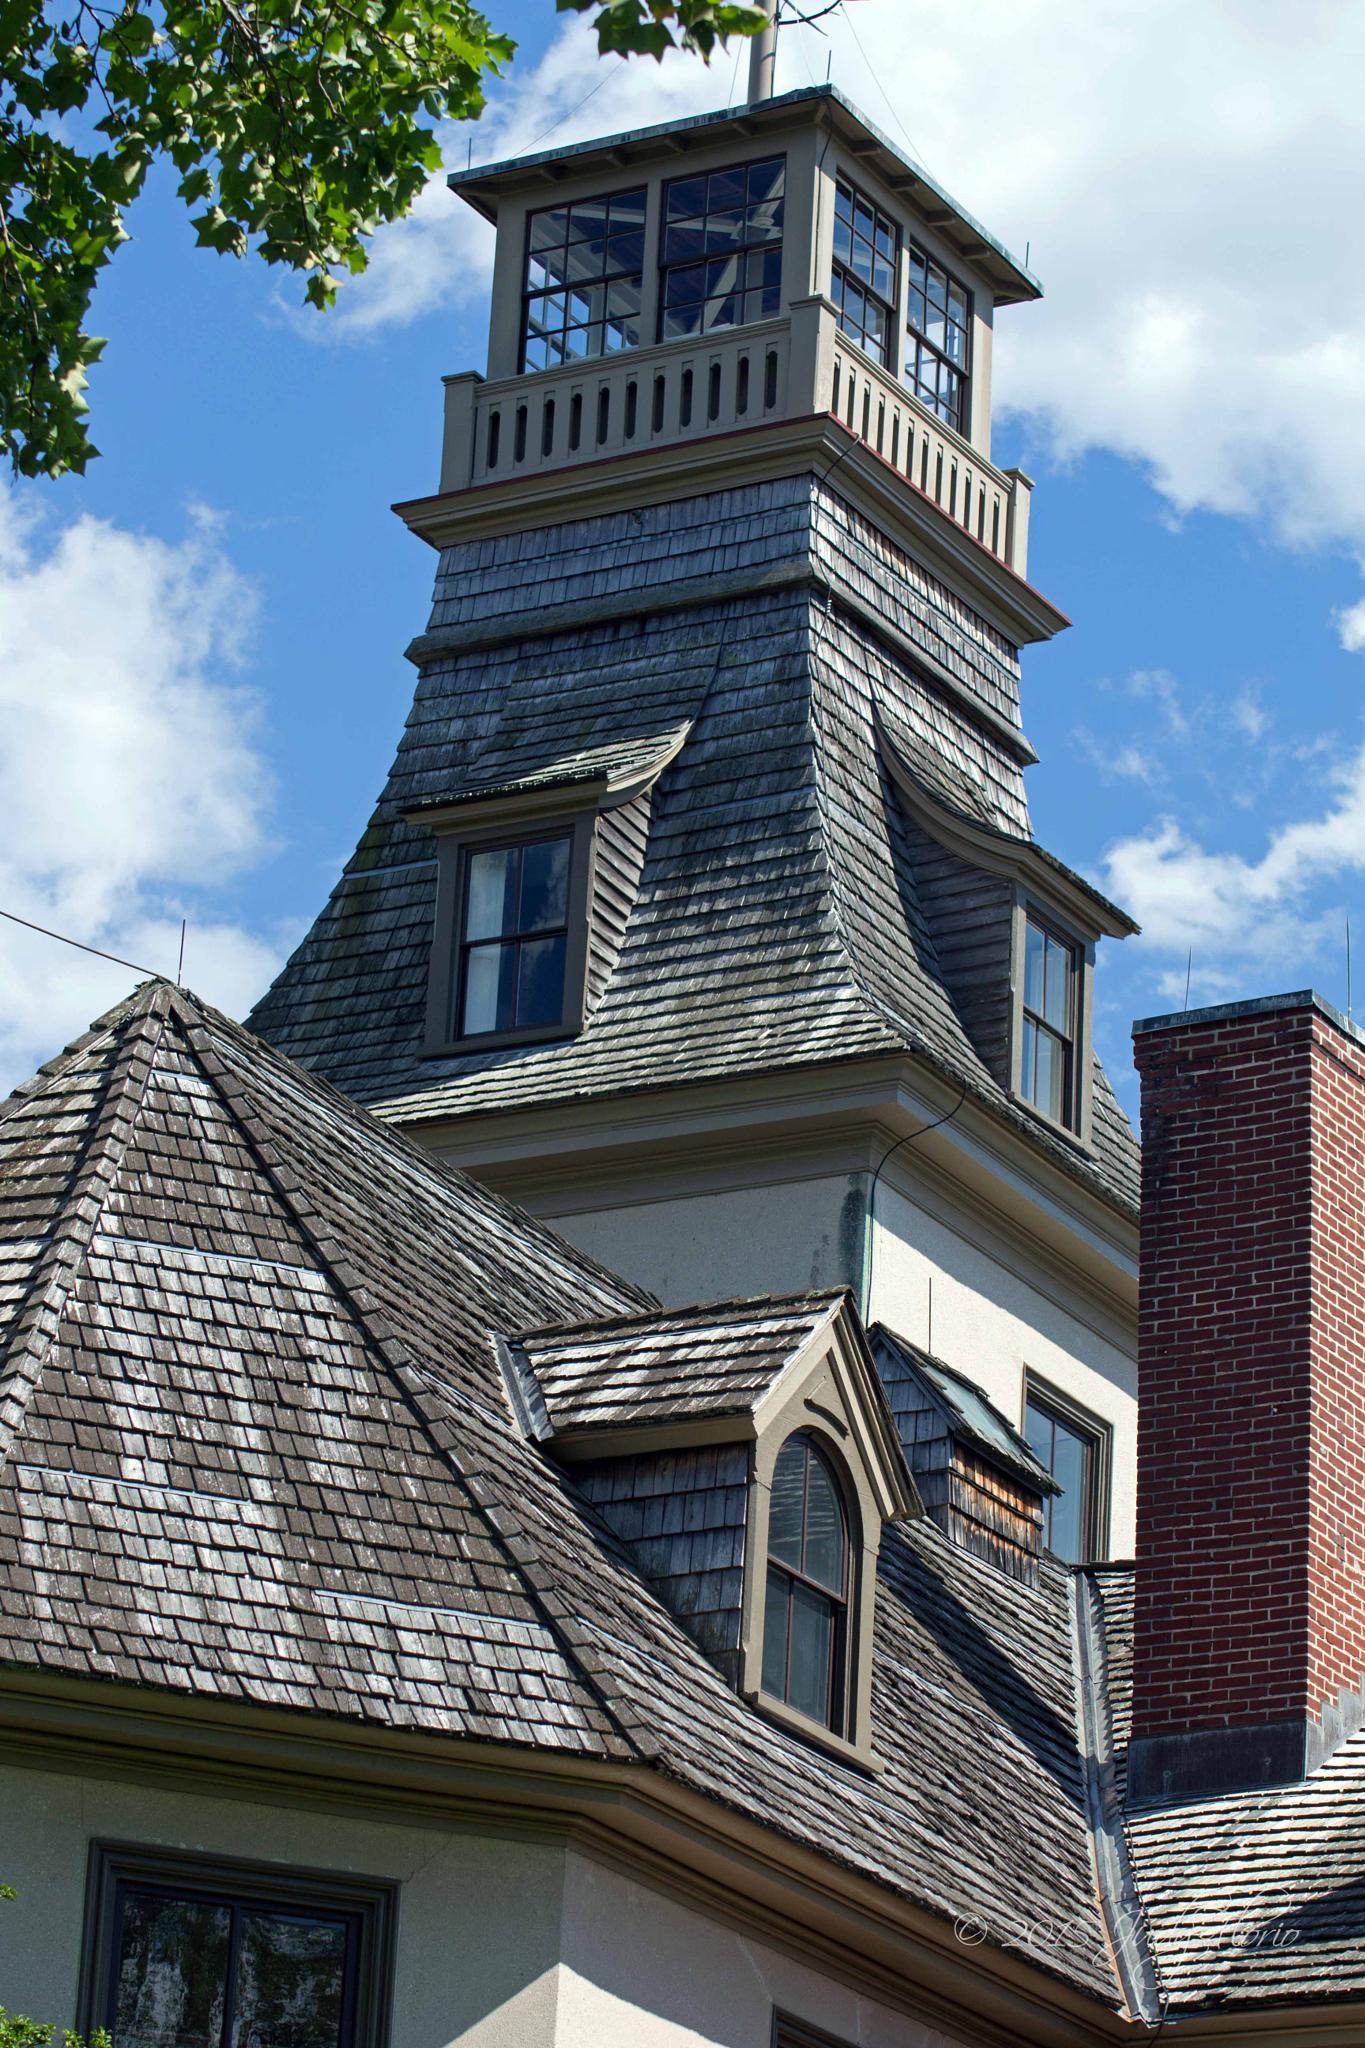 Batsto Village Mansion by Judy Florio